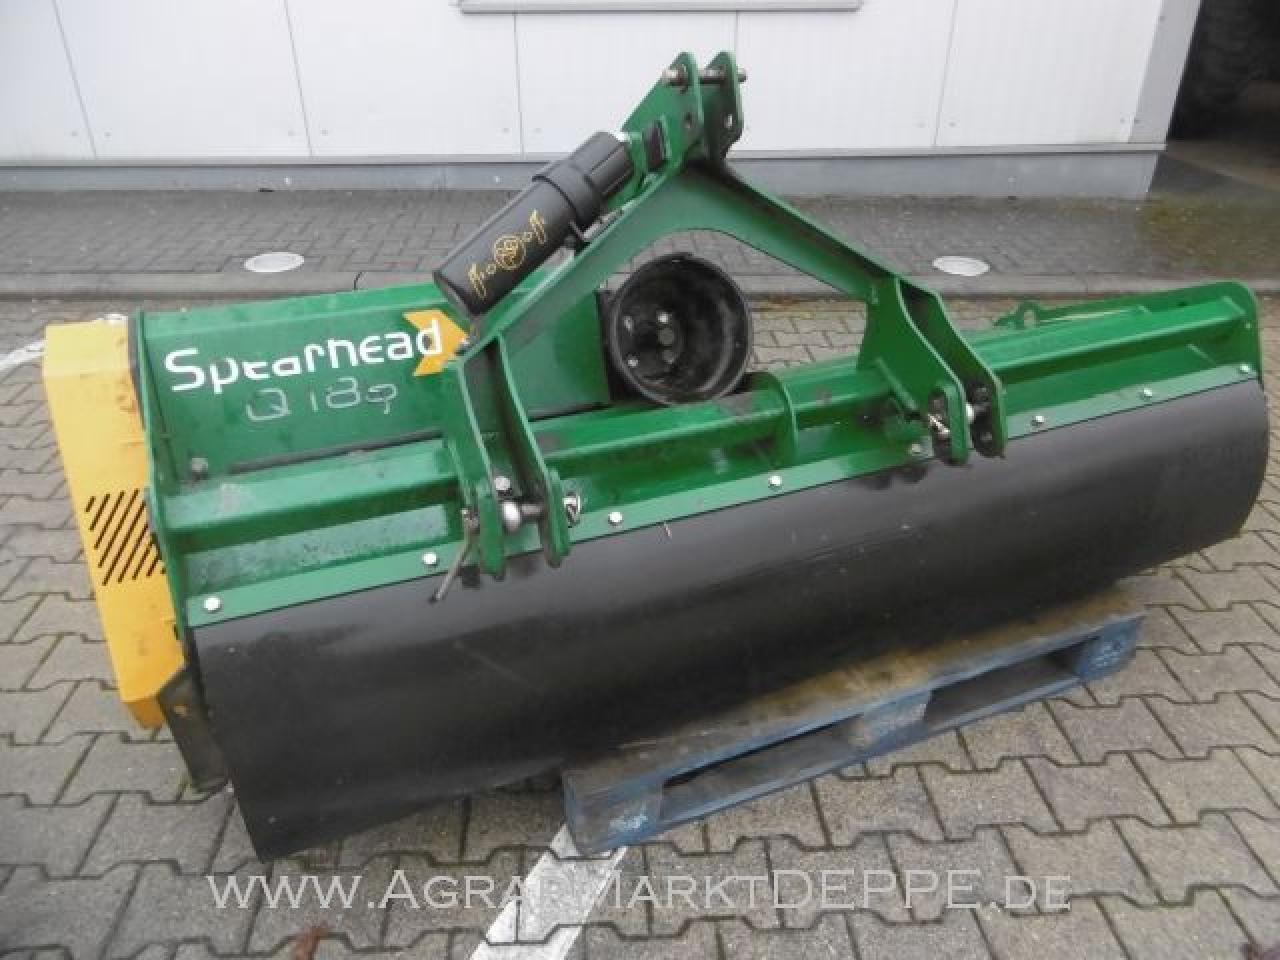 Spearhead Q18S